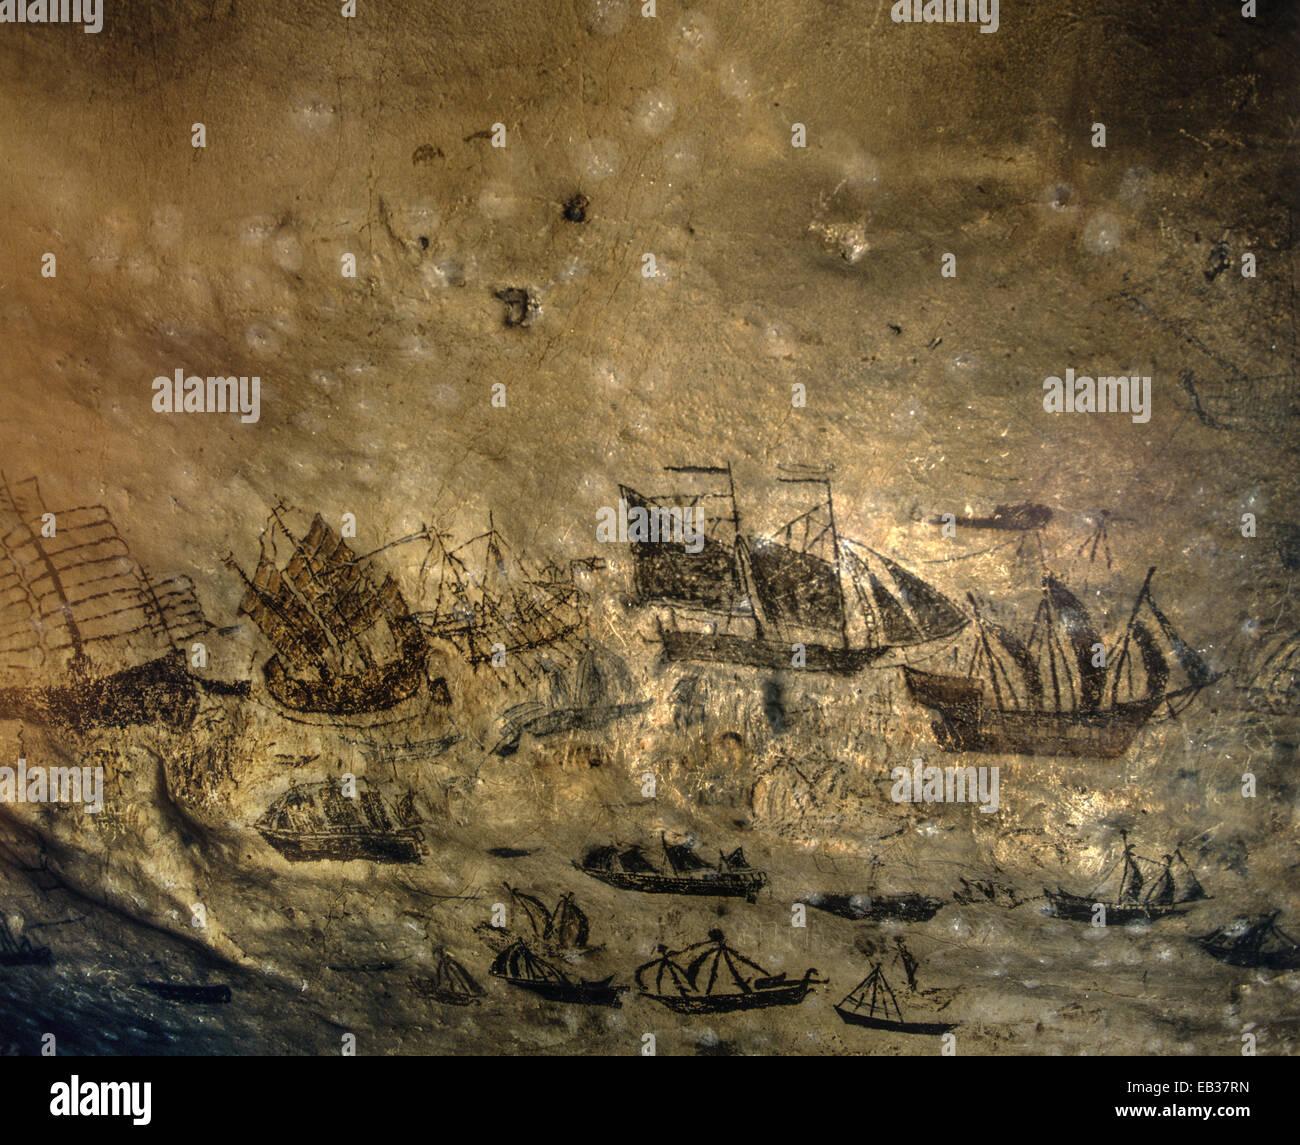 Viking Cave Wai King Historical Wall Paintings Of Various Ships Ko Phi Lee Islands Krabi Province